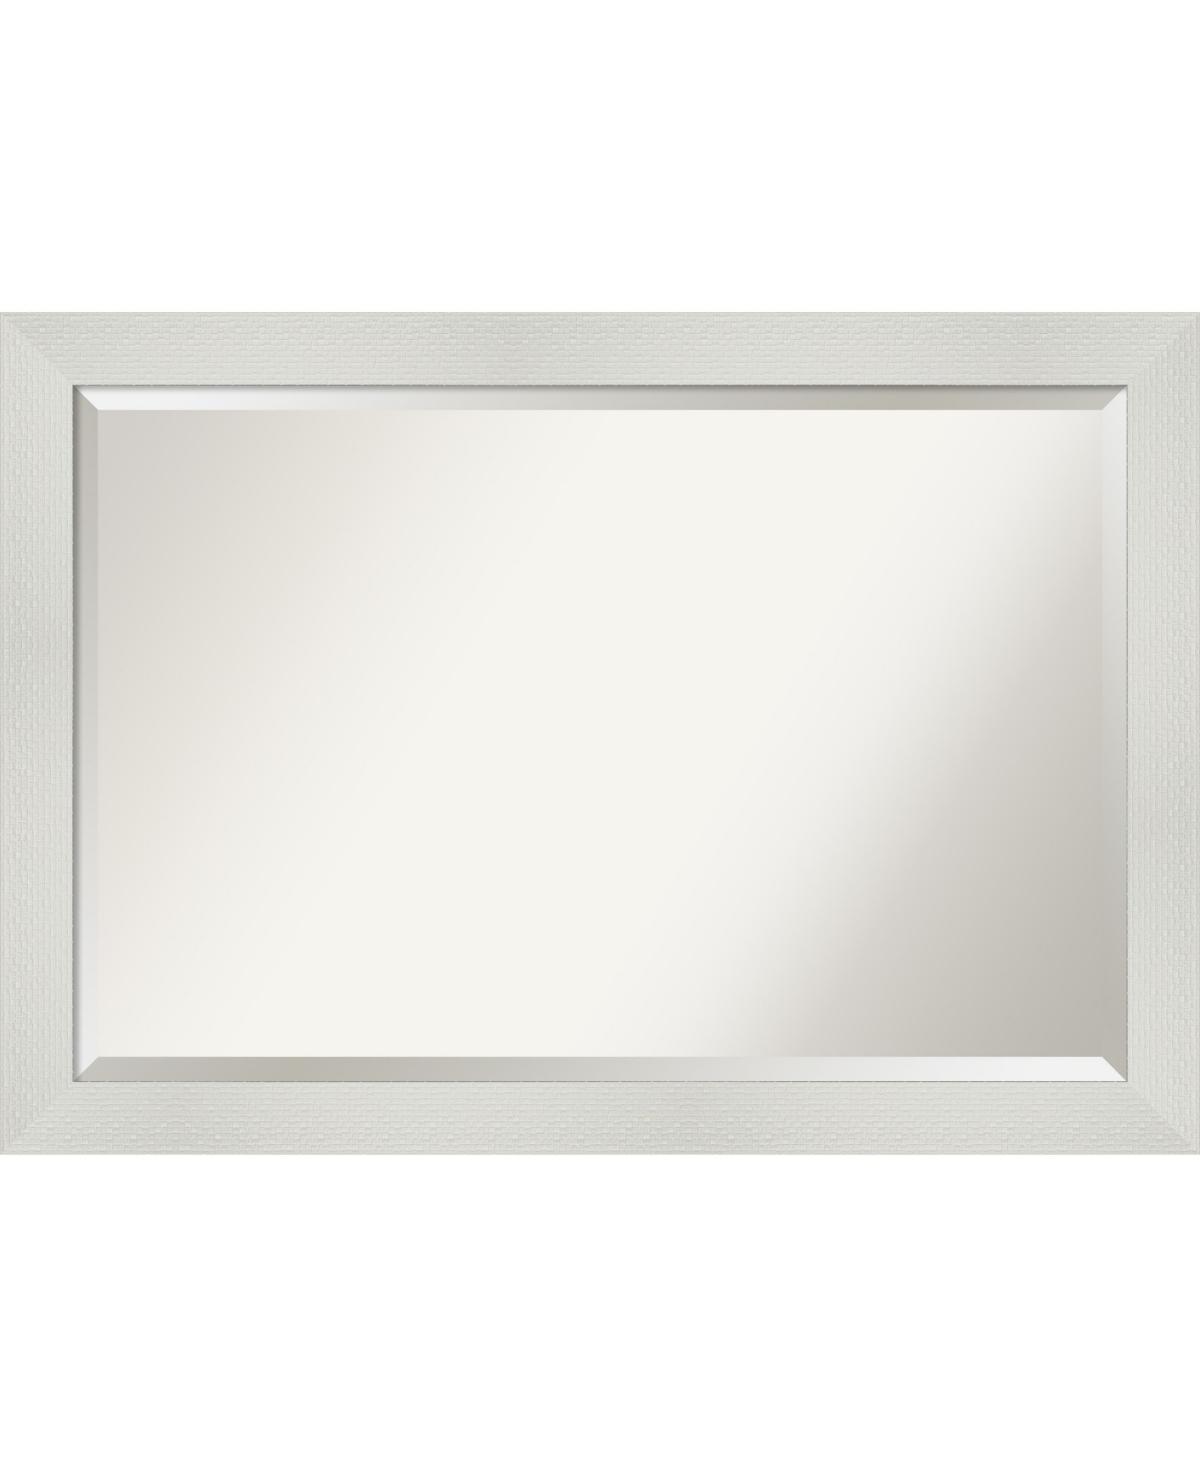 Amanti Art Mosaic Framed Bathroom Vanity Wall Mirror, 40.25